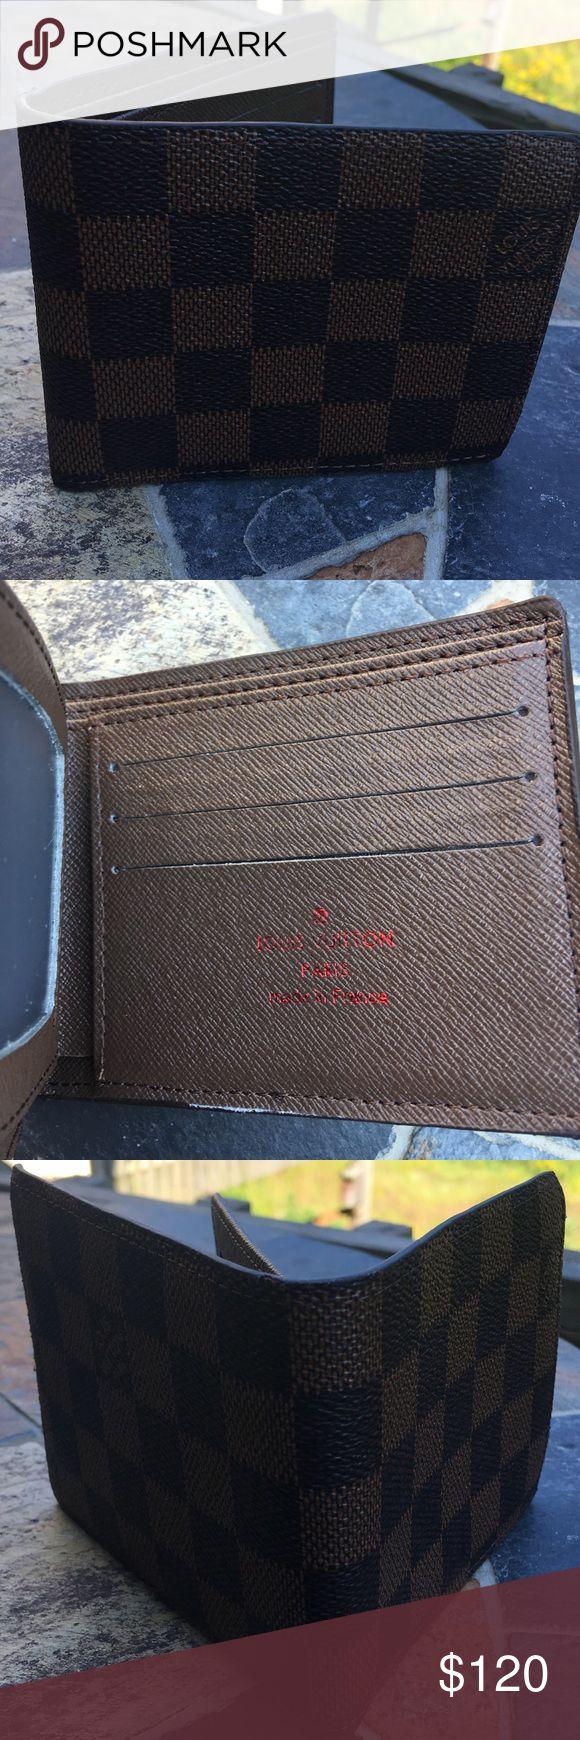 Louis Vuitton Wallet Price reflects a brand new Louis Vuitton wallet. No Flaws. OBO. No Lowballing Louis Vuitton Accessories